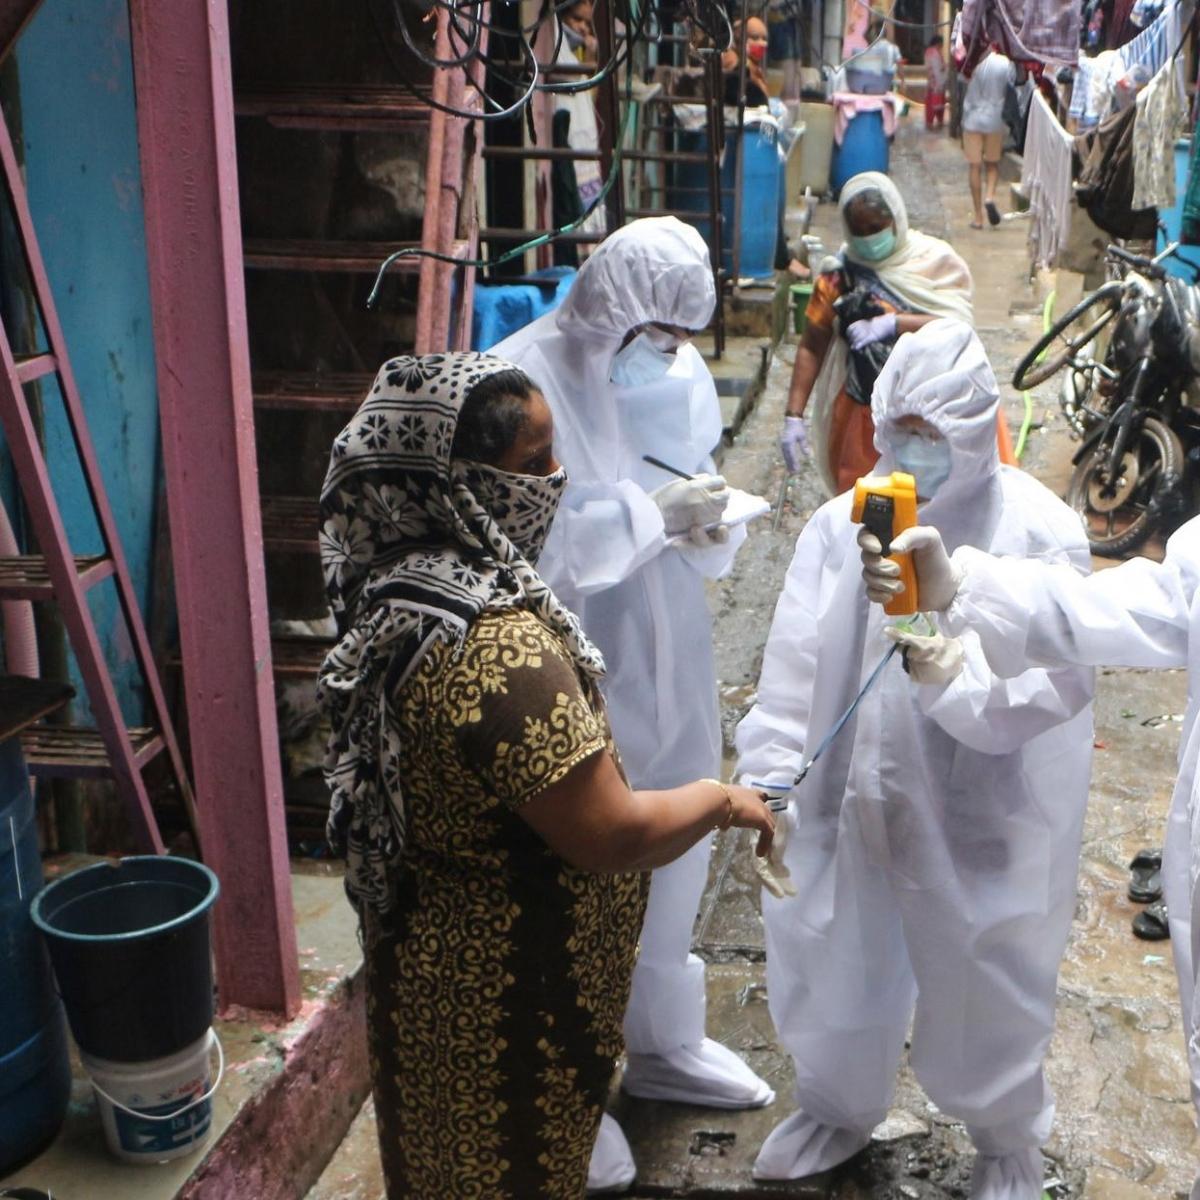 Coronavirus in Mumbai: Second sero survey indicates 41-60 age group is most exposed to COVID-19